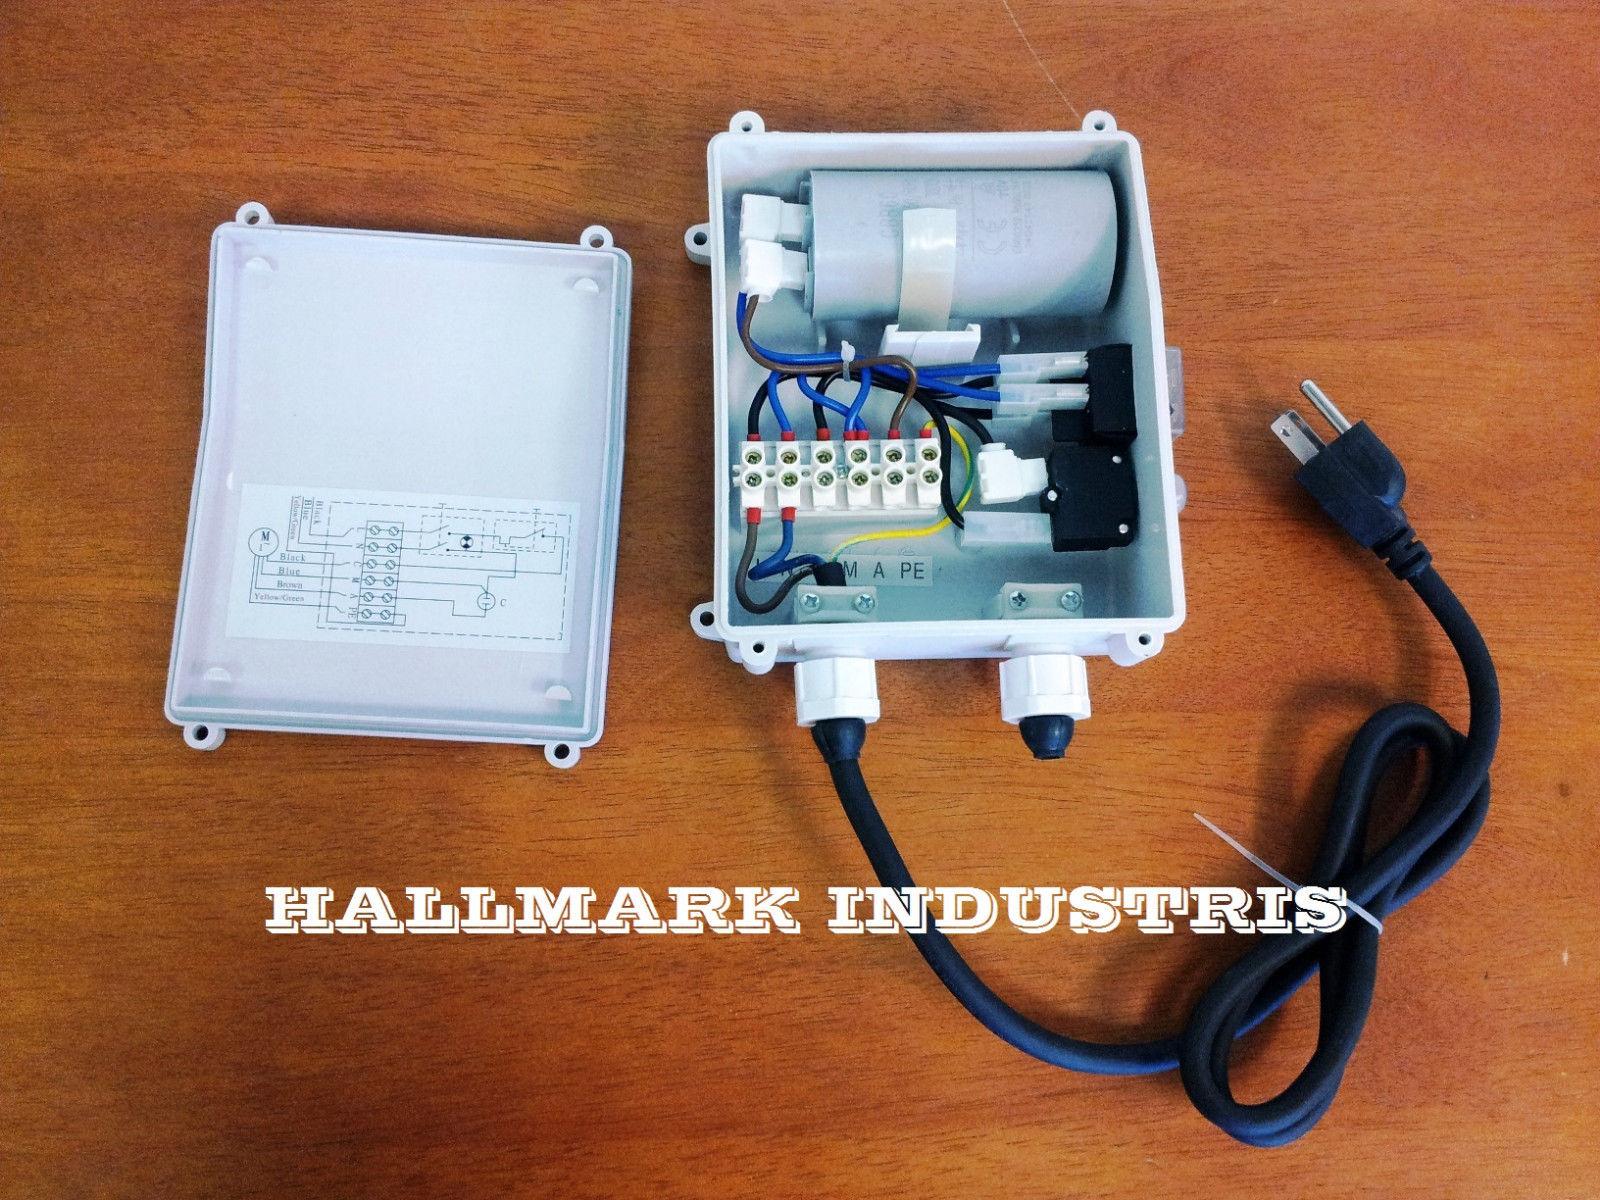 Hallmark Industries Pump Control Box - Well Pump Control Box Wiring Diagram